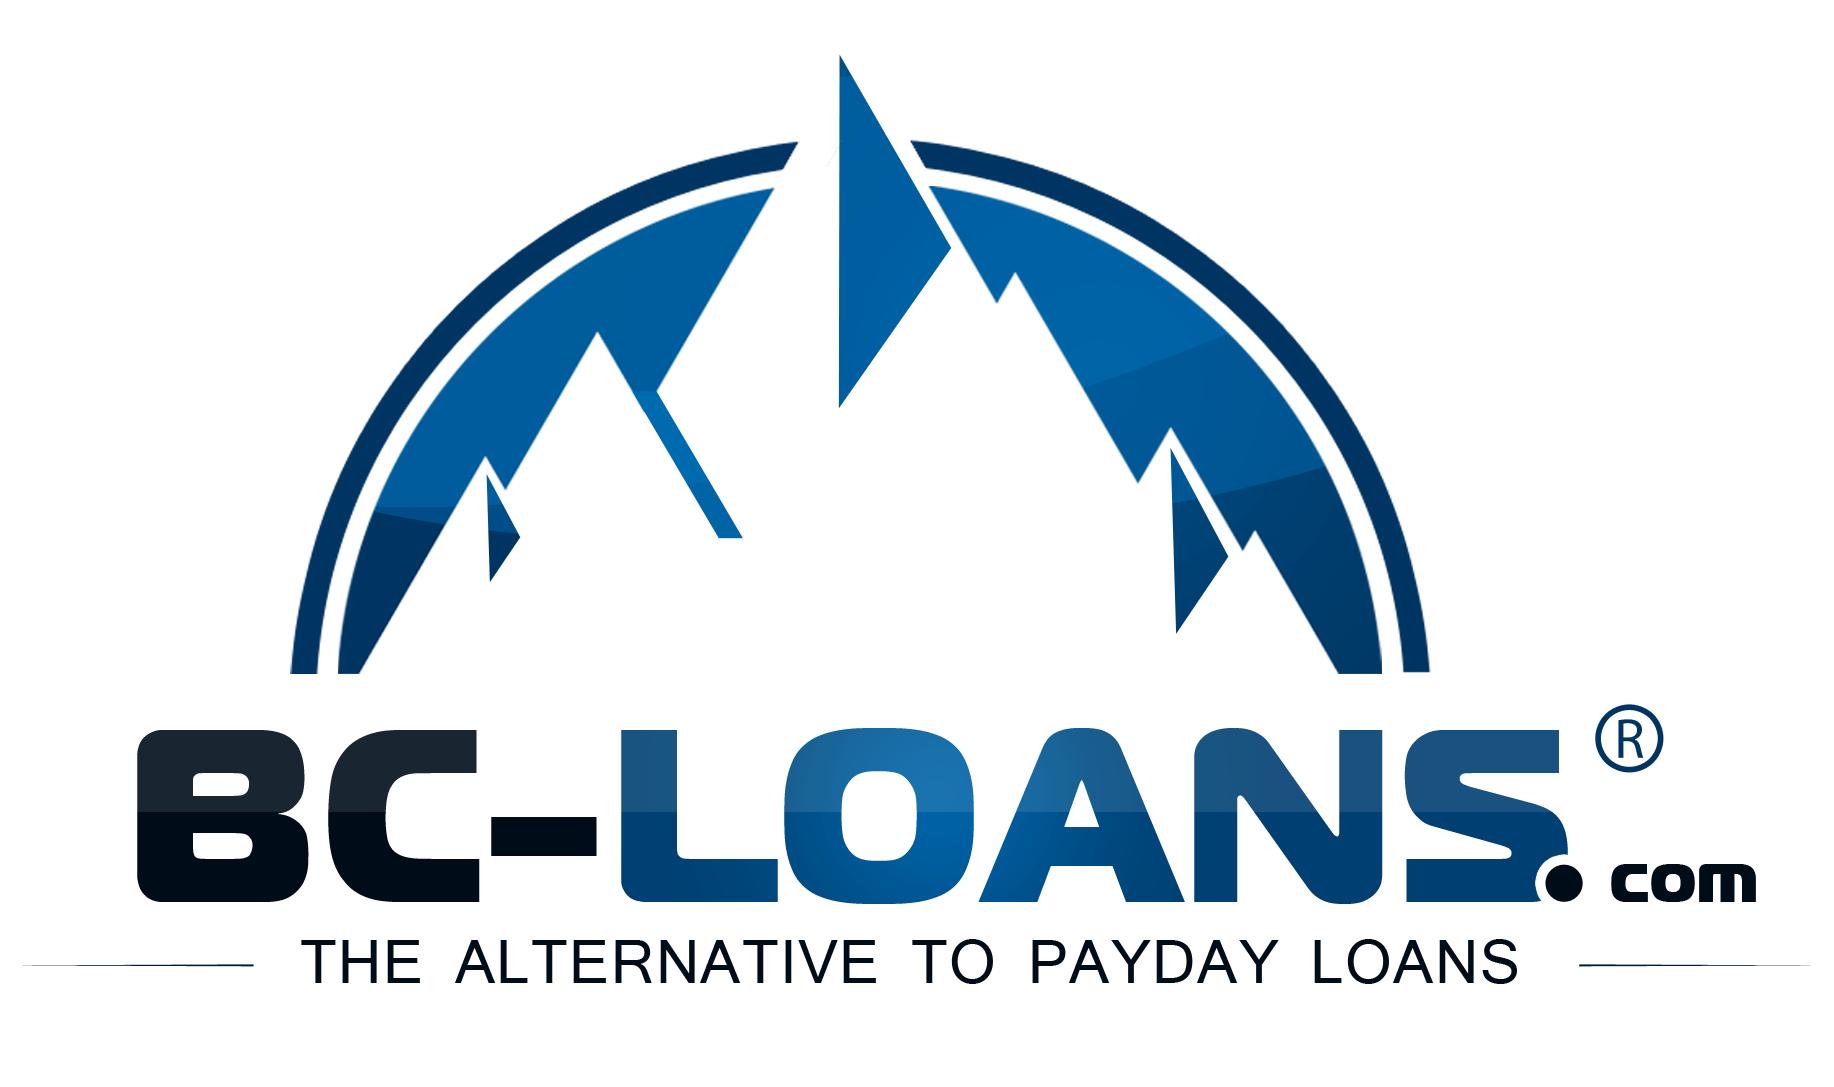 Installement loans - $500 - $750 - Bad Credit Loans & No